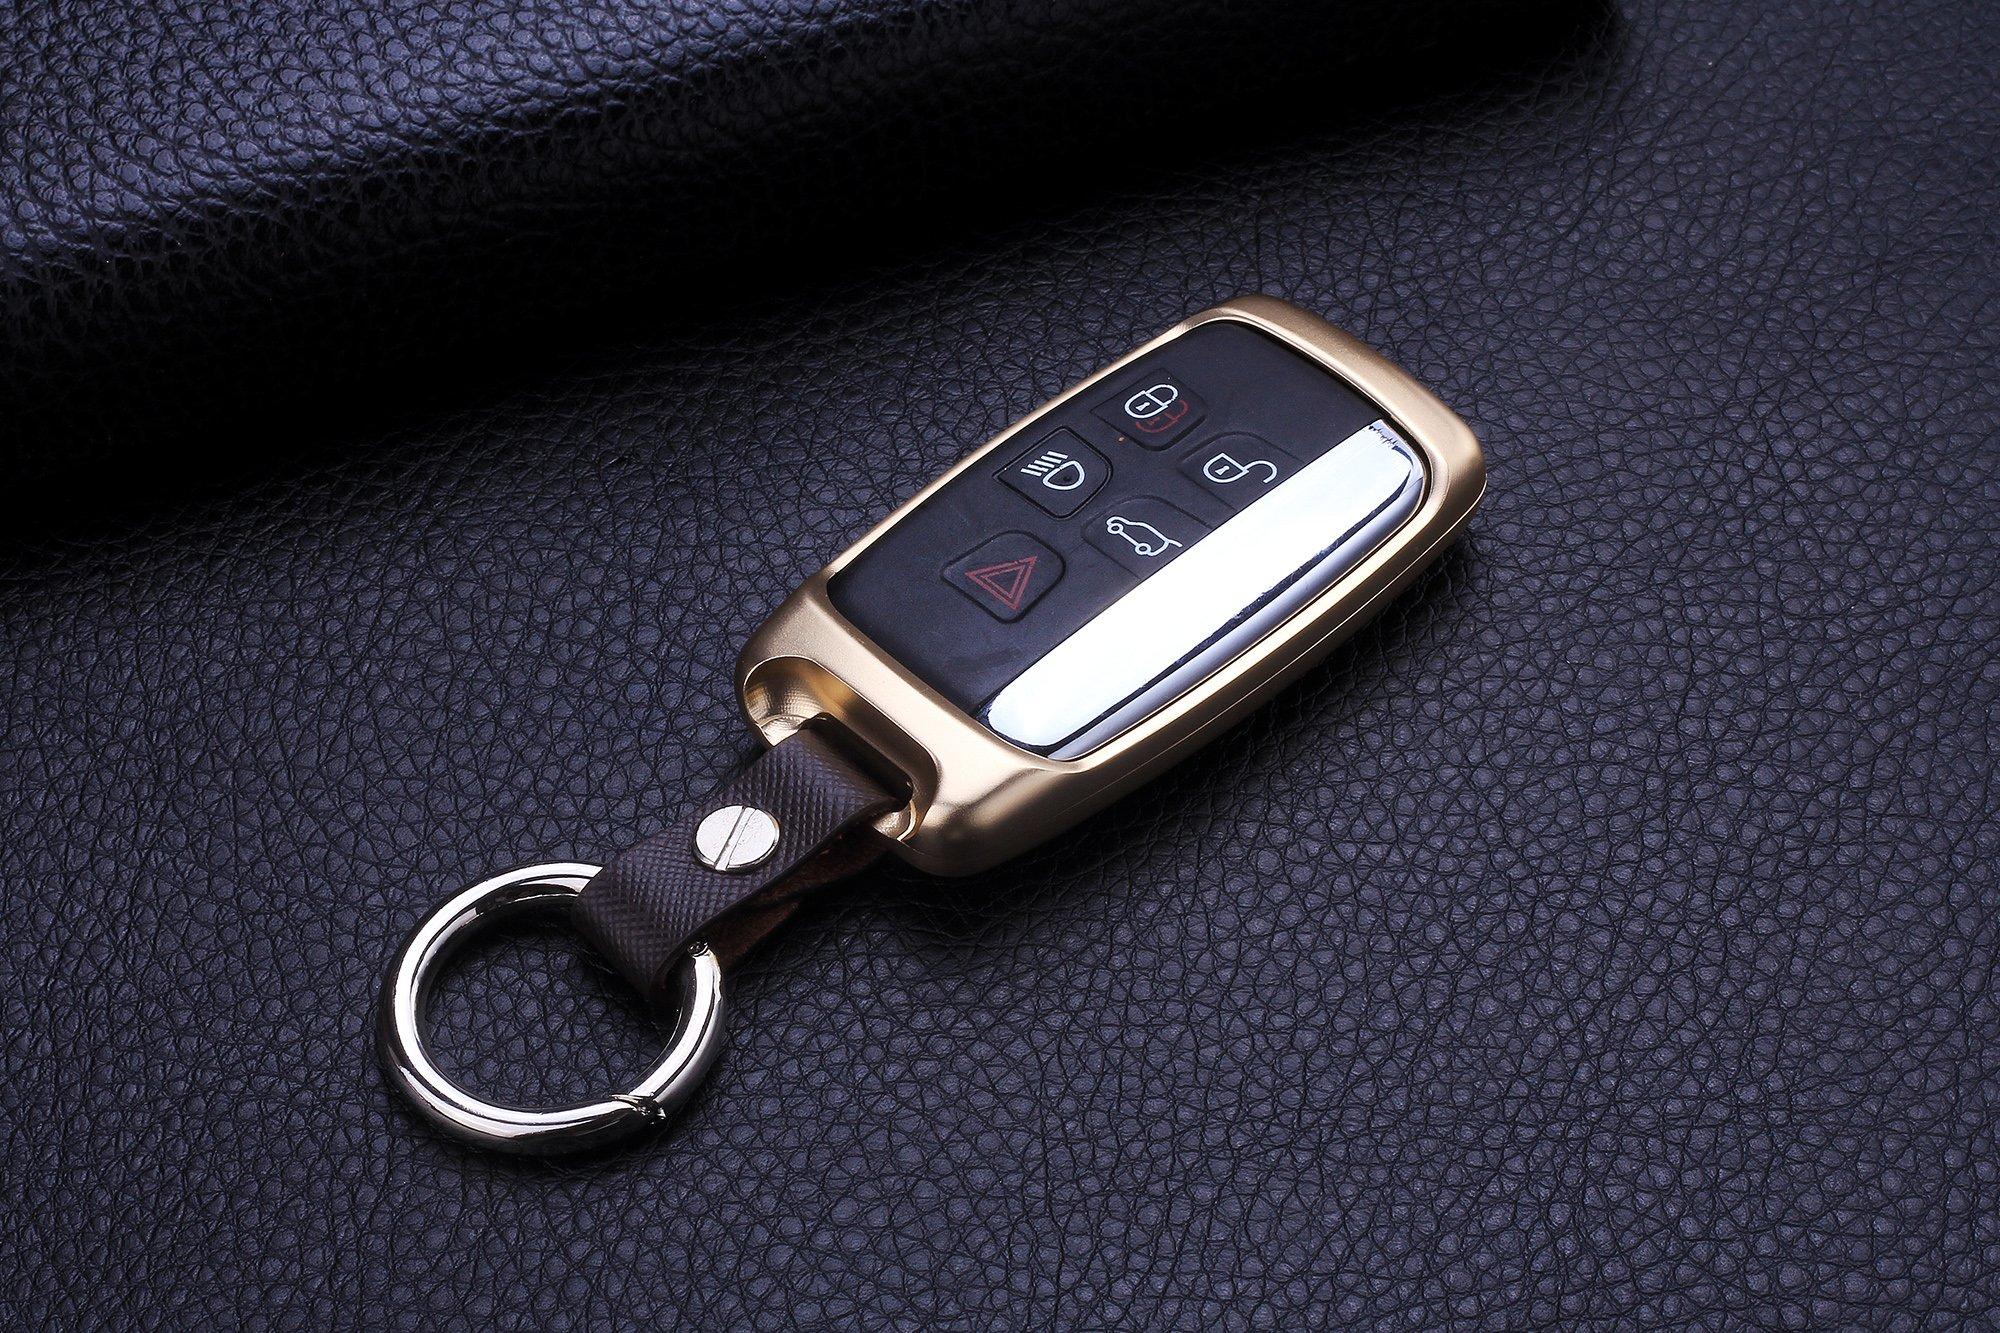 [M.JVisun] Car Key Fob Cover For Jaguar XE Jaguar XF Jaguar XJ Jaguar F-PACE Jaguar F-TYPE Remote Key , Smart Car Key Case Cover Skin , Aircraft Grade Aluminum + Genuine Leather Keychain - Gold